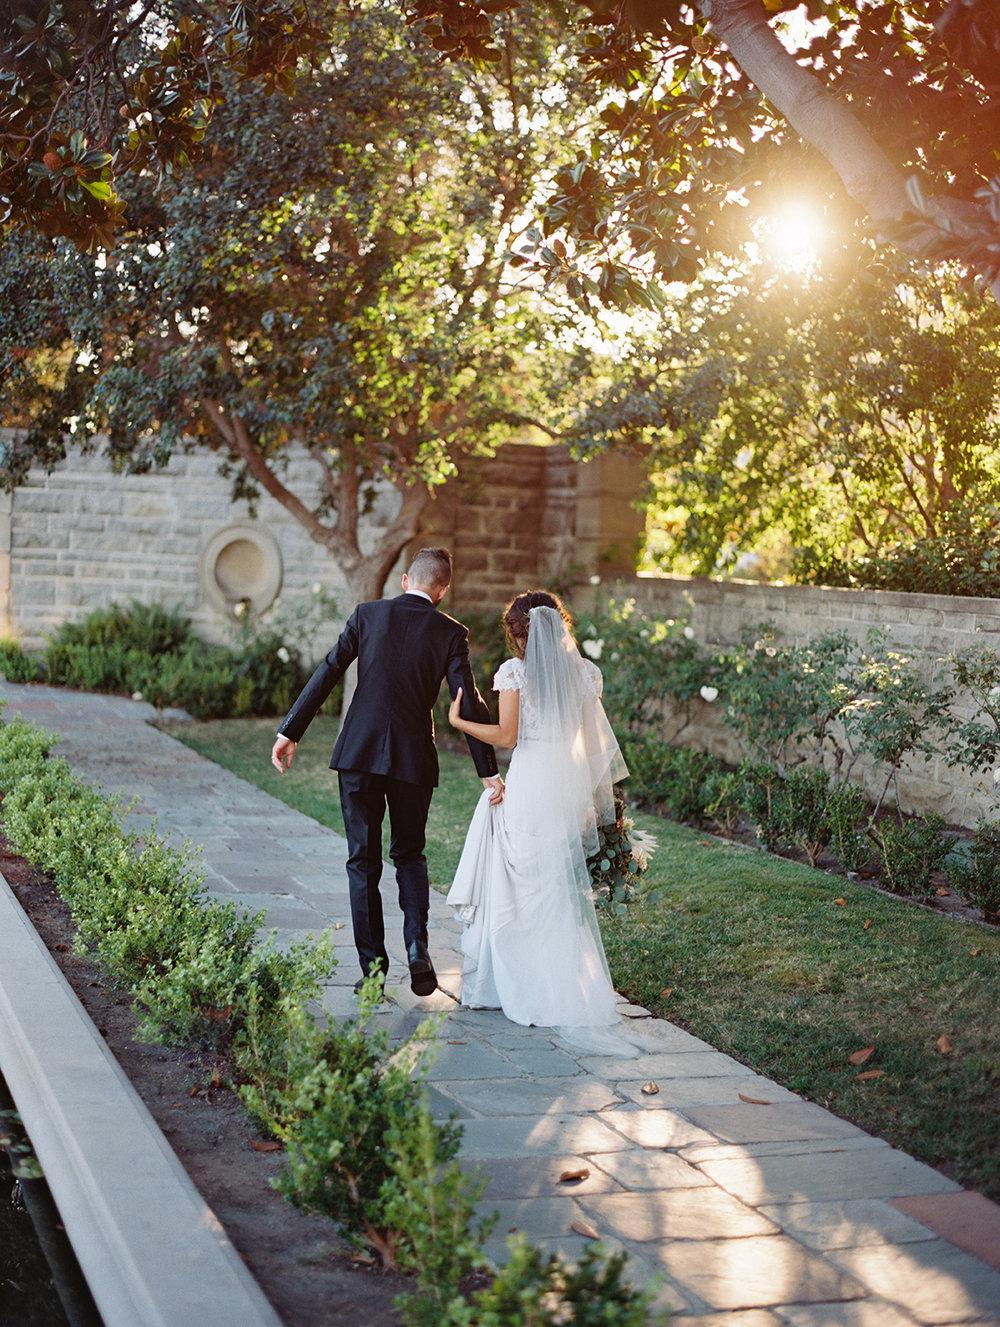 265-brian-sarra-los-angeles-wedding-brumley-wells-photography.jpg